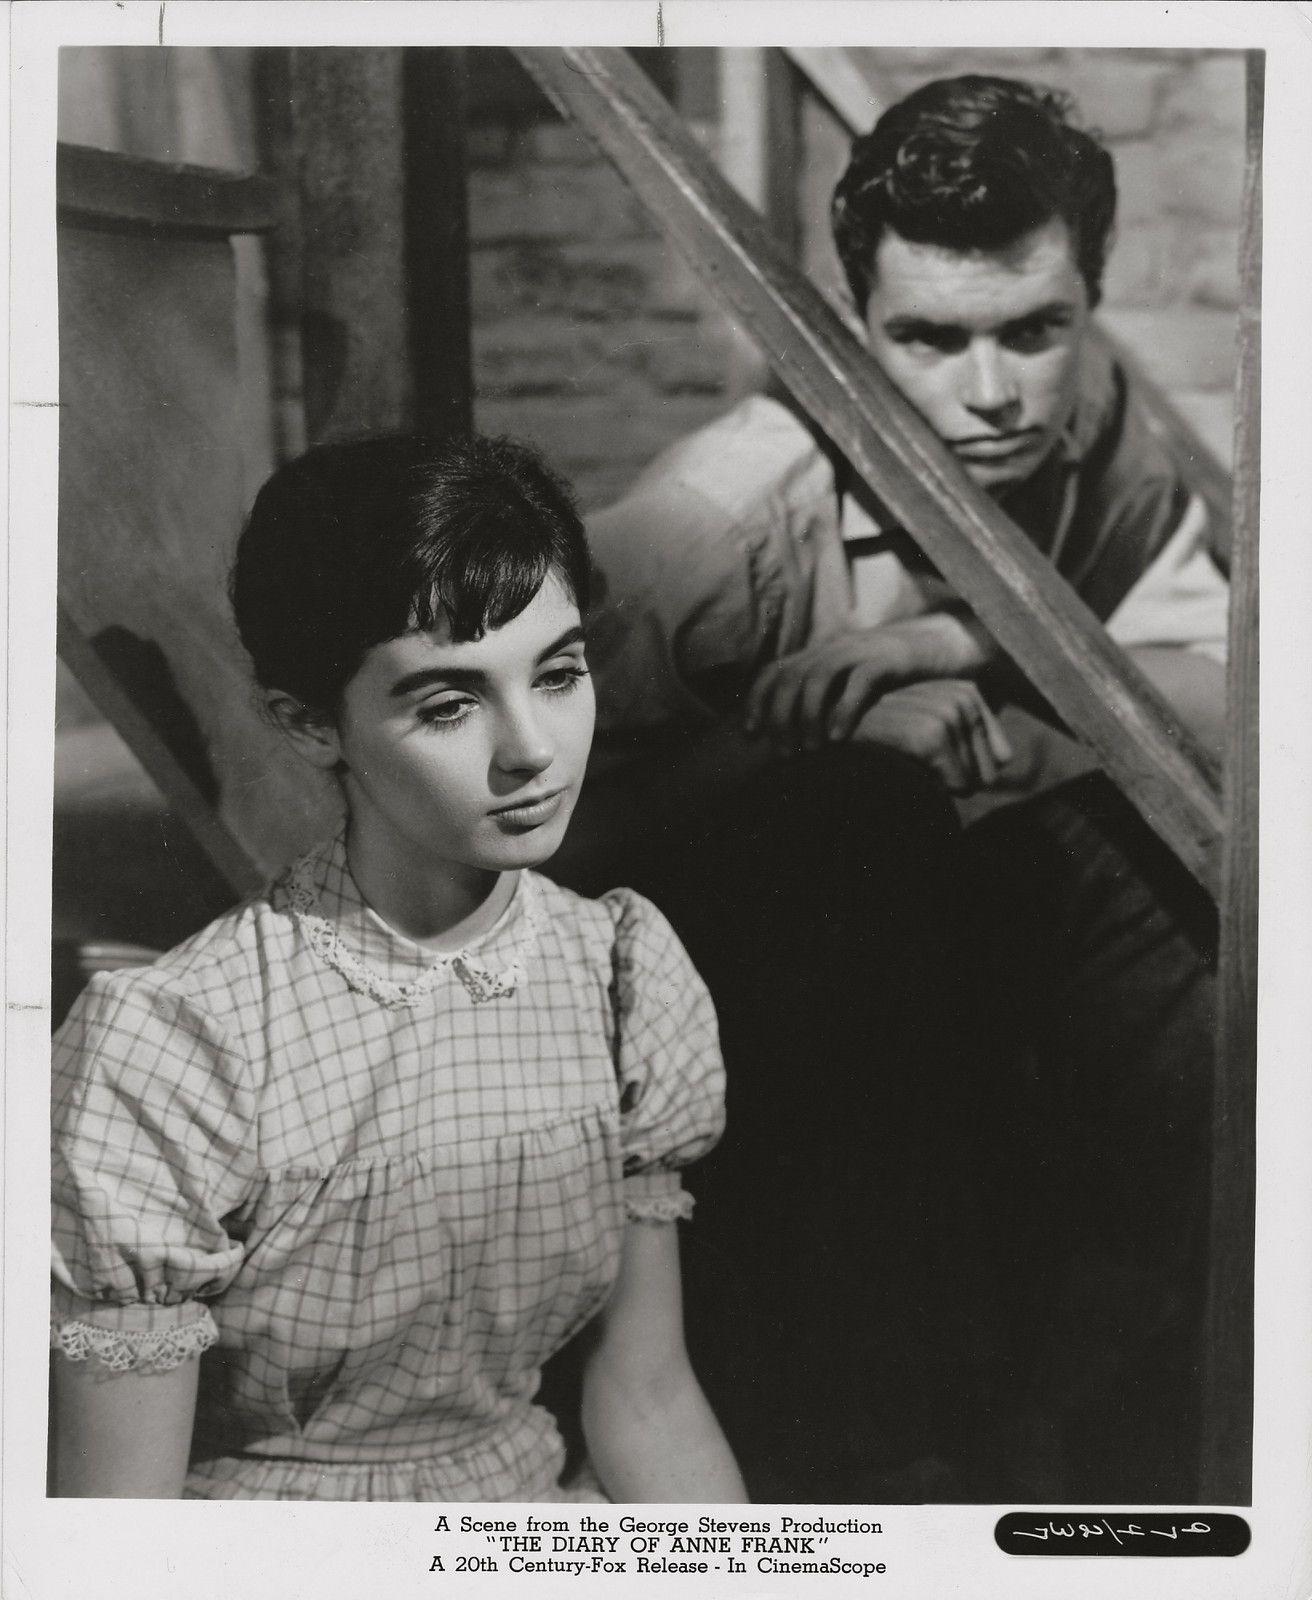 Millie Perkins, Richard Beymer, Diary of Anne Frank, 1959